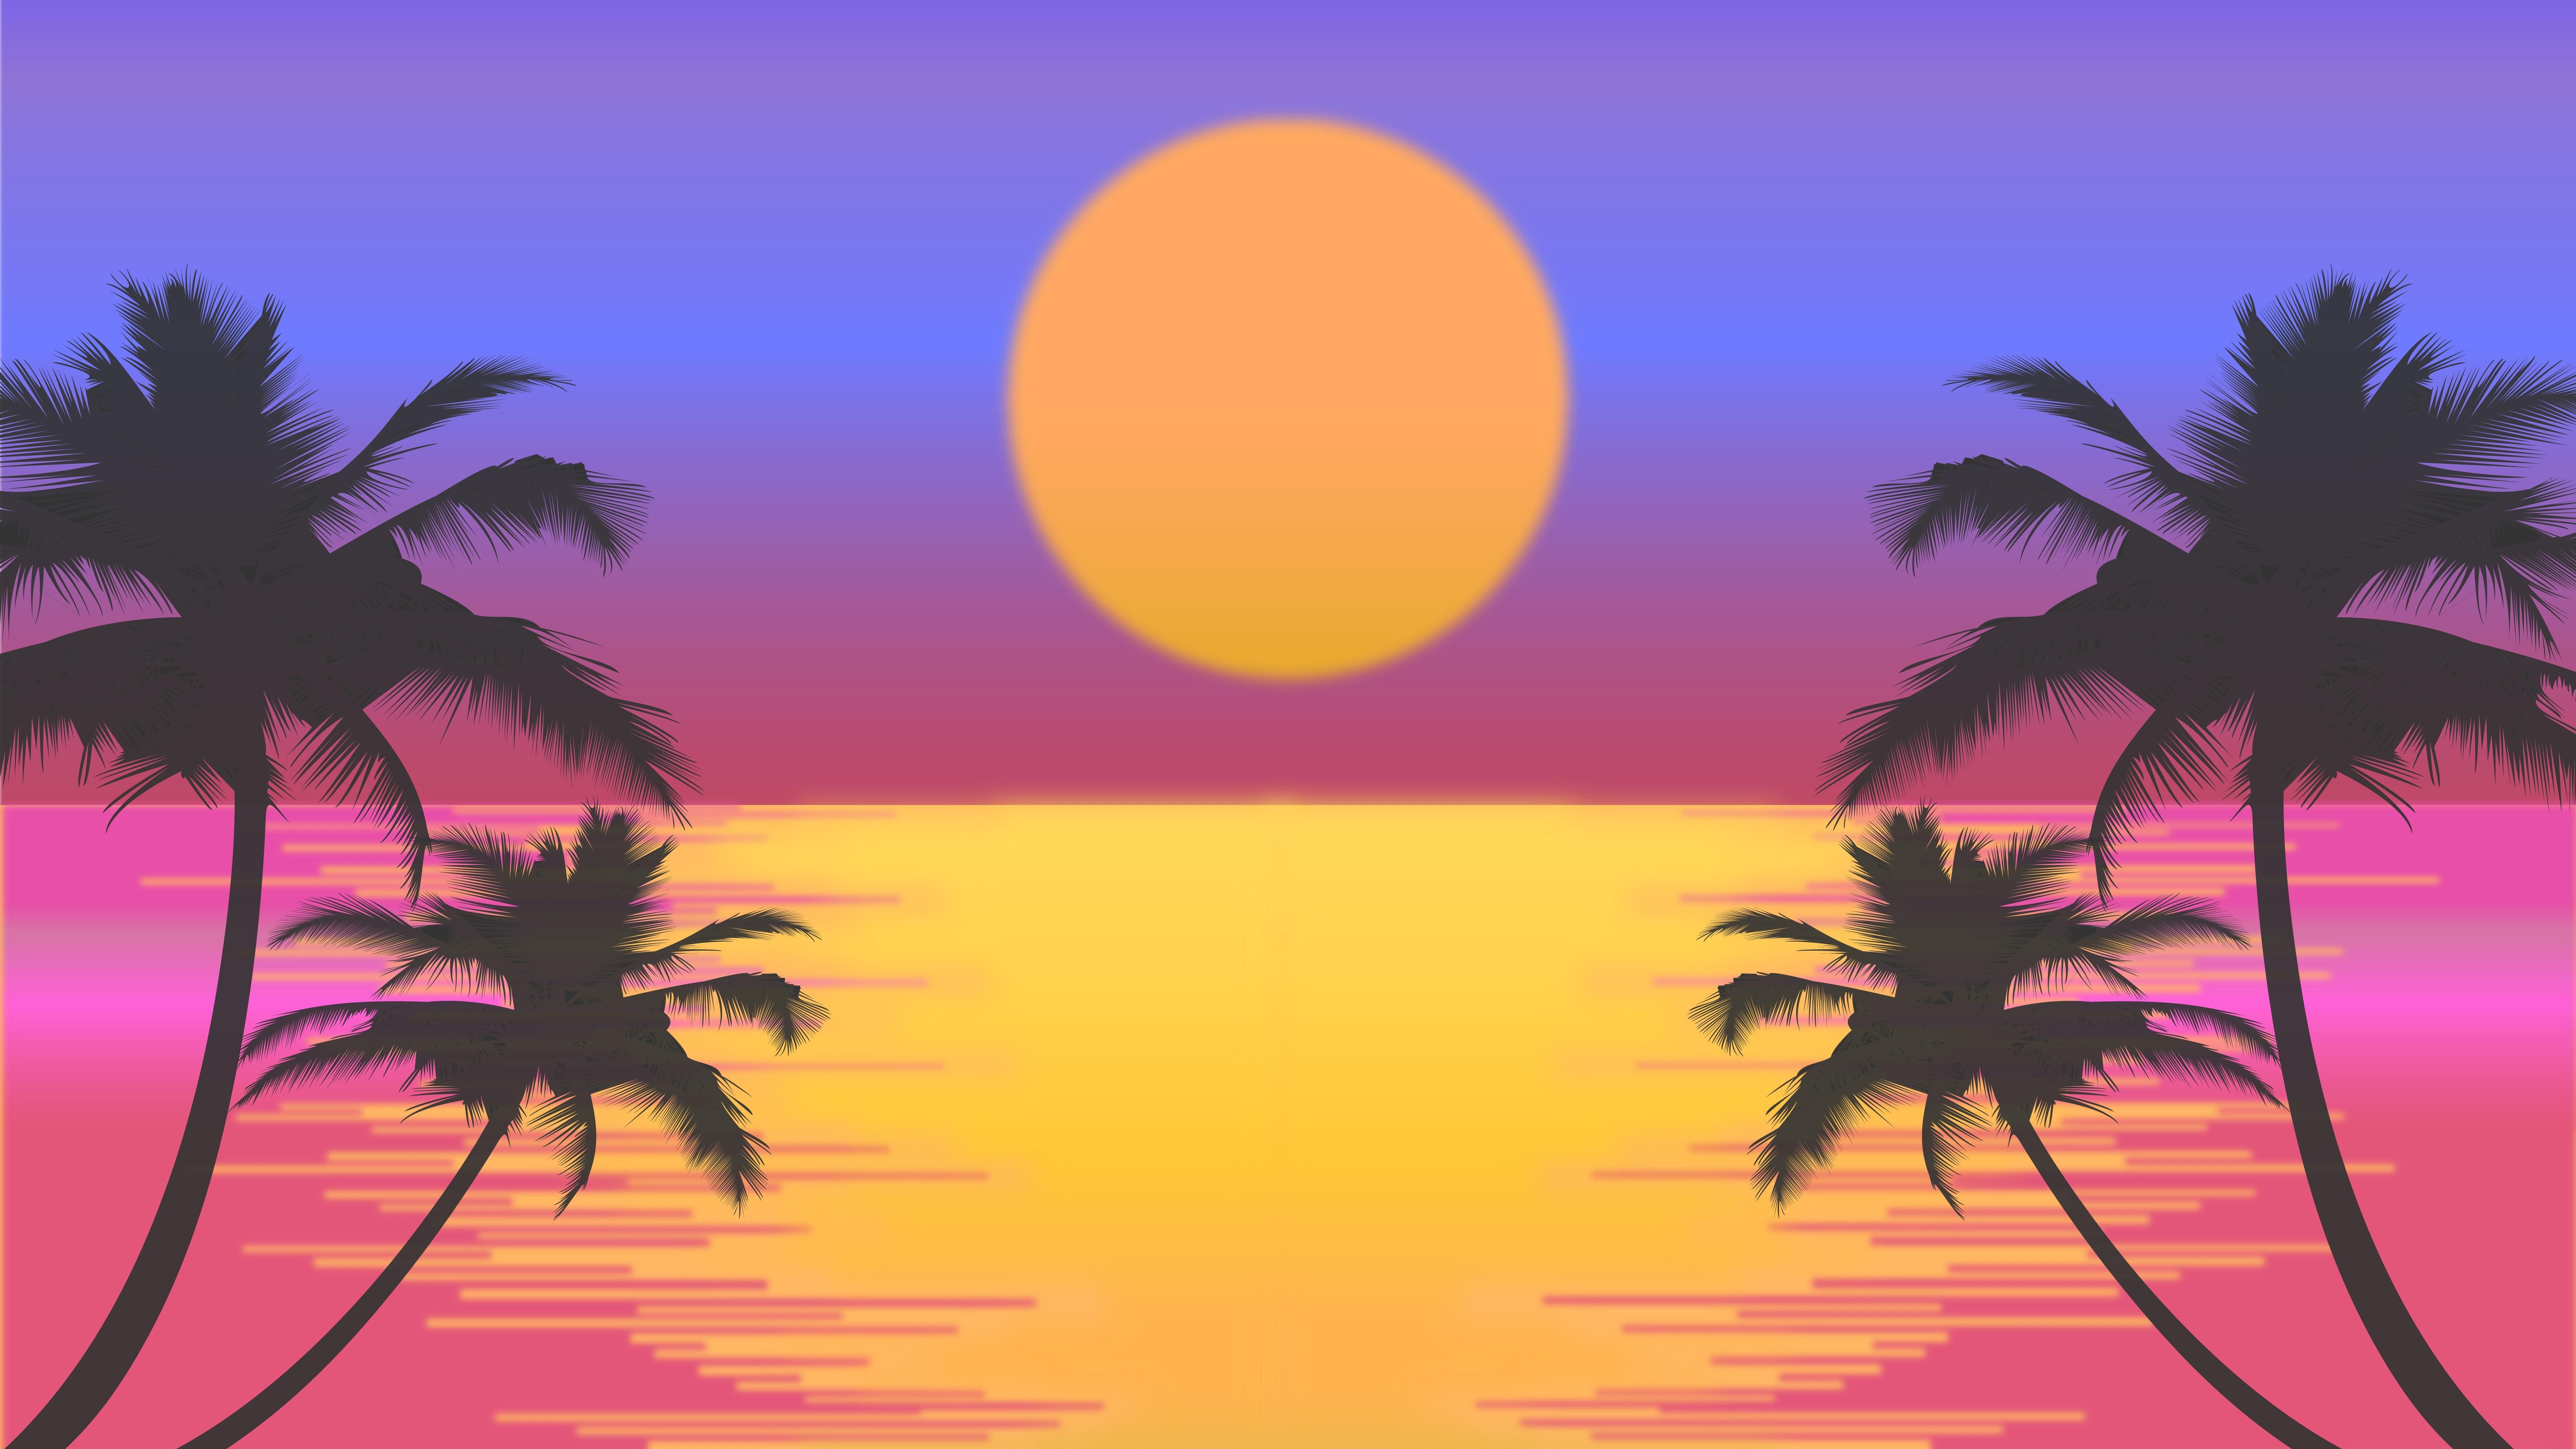 7680x4320 palm trees sun vector artwork 8k 8k hd 4k wallpapers